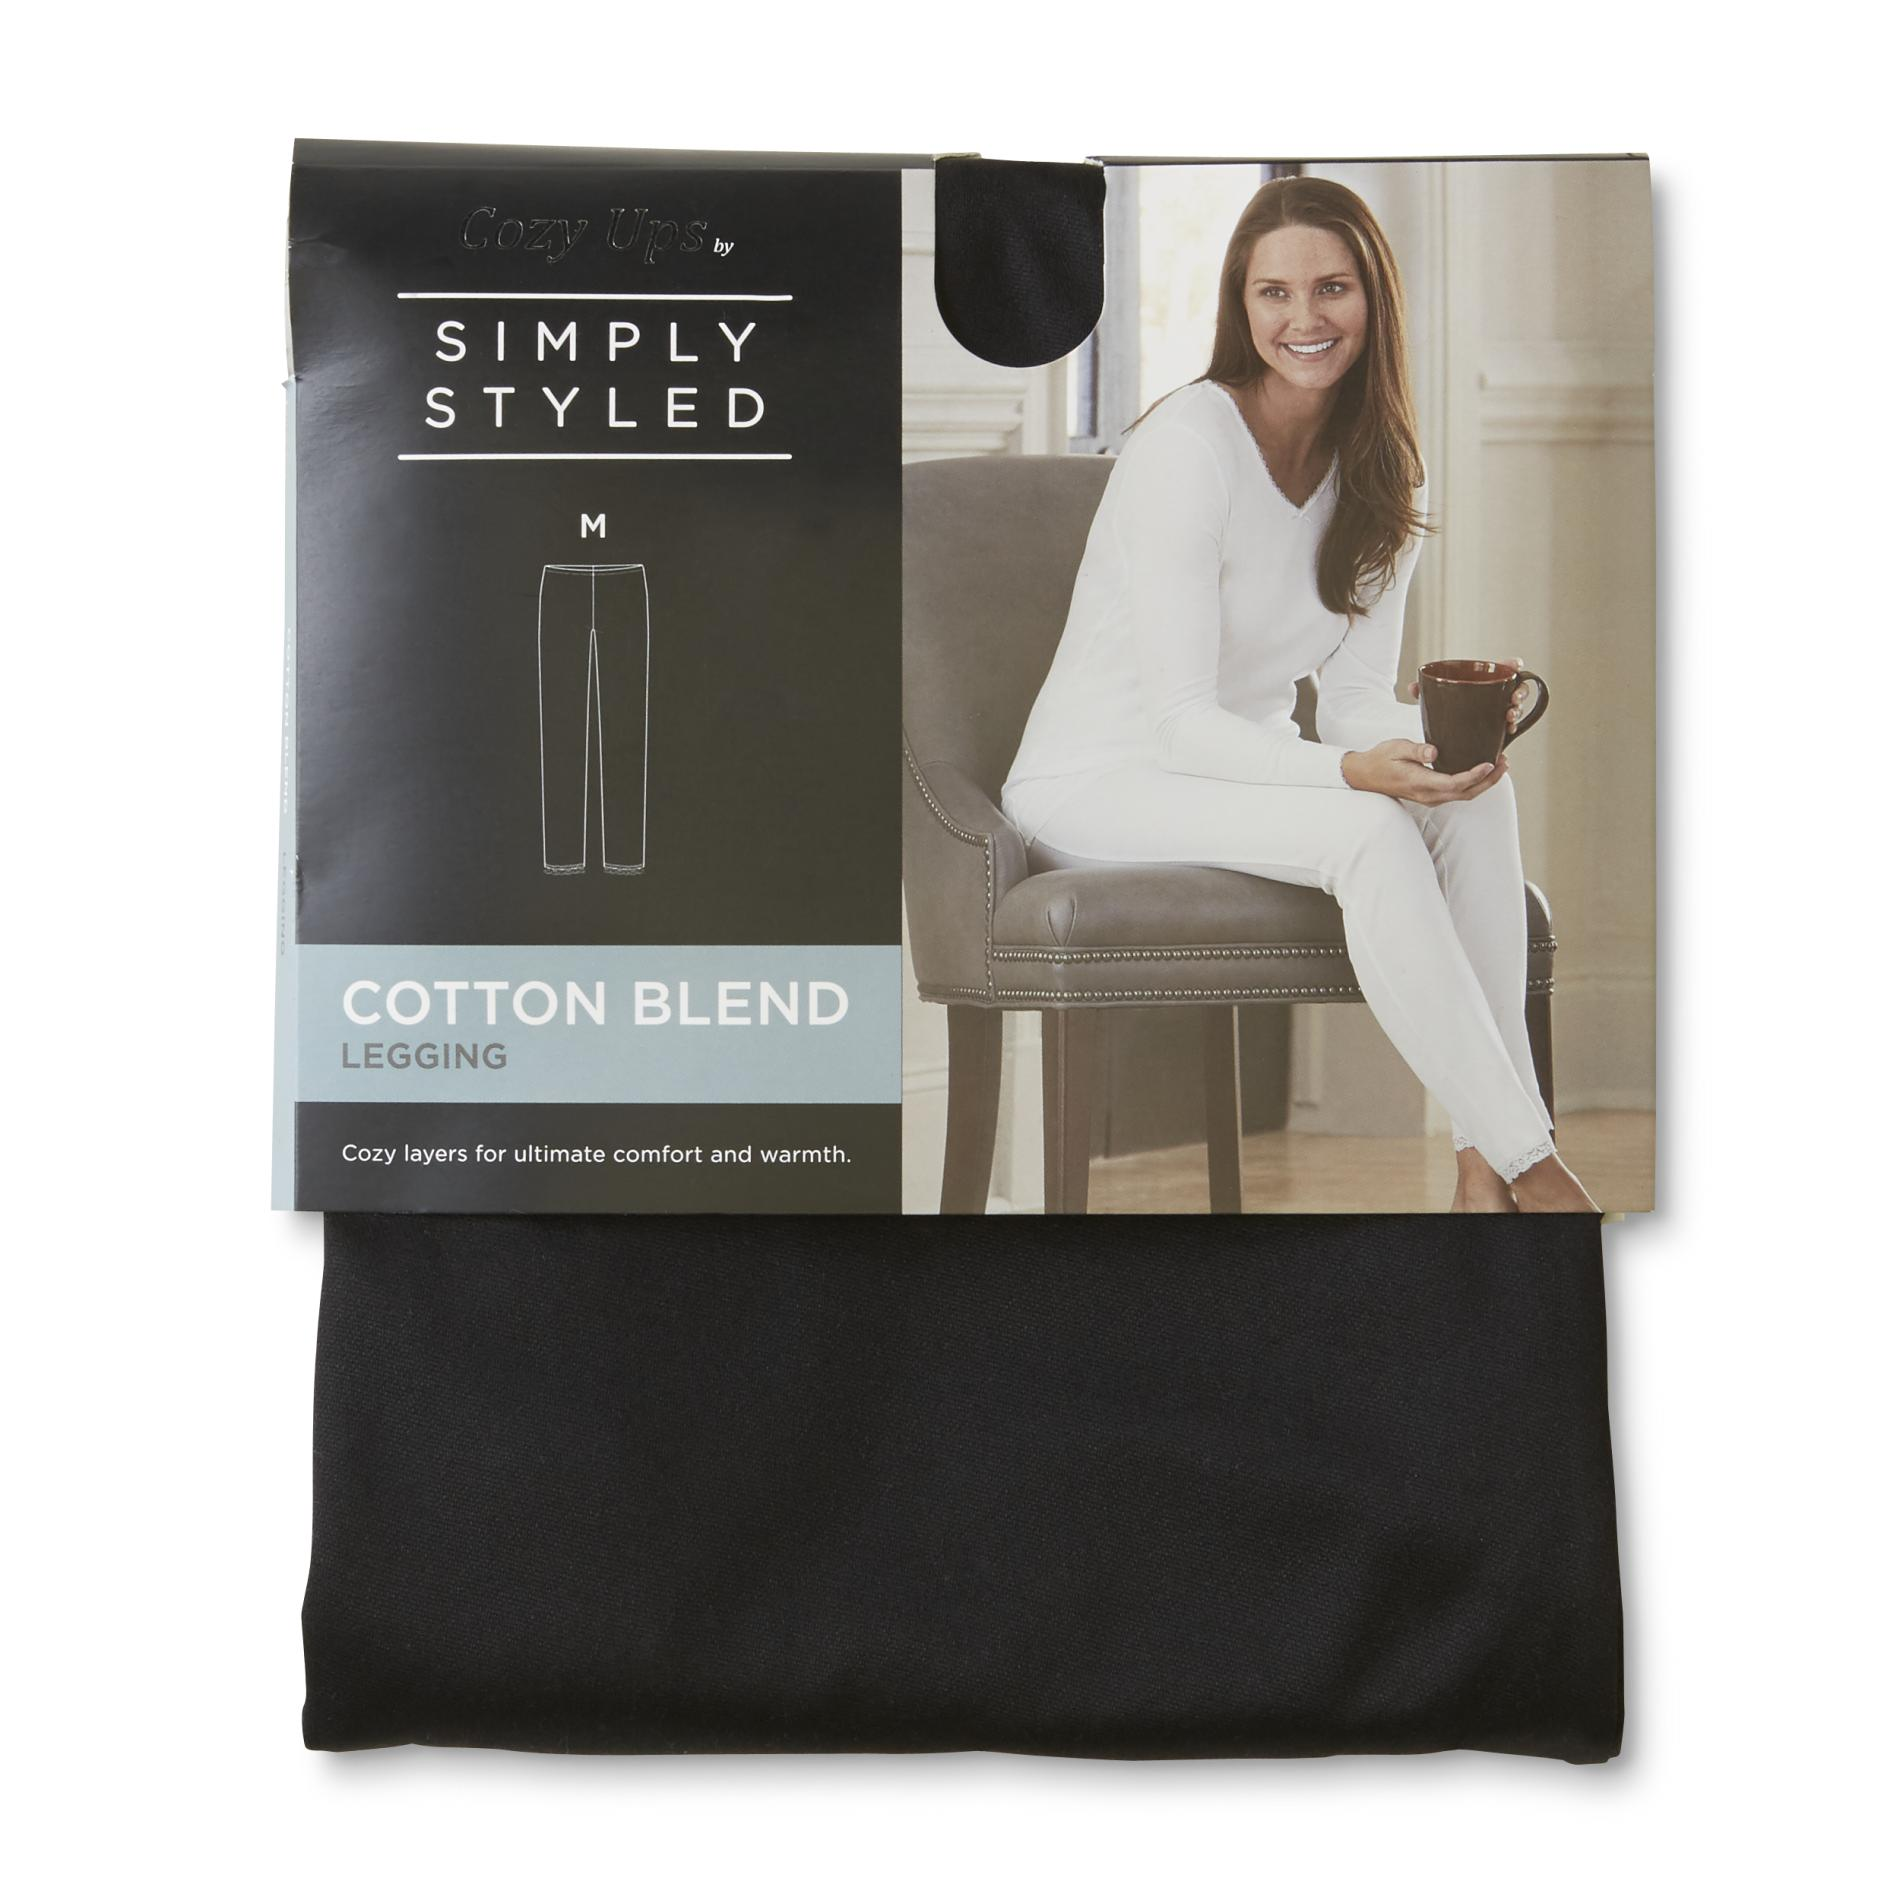 Simply Styled Women's Cotton-Blend Leggings PartNumber: 018VA99008312P MfgPartNumber: LF7SS39004MI